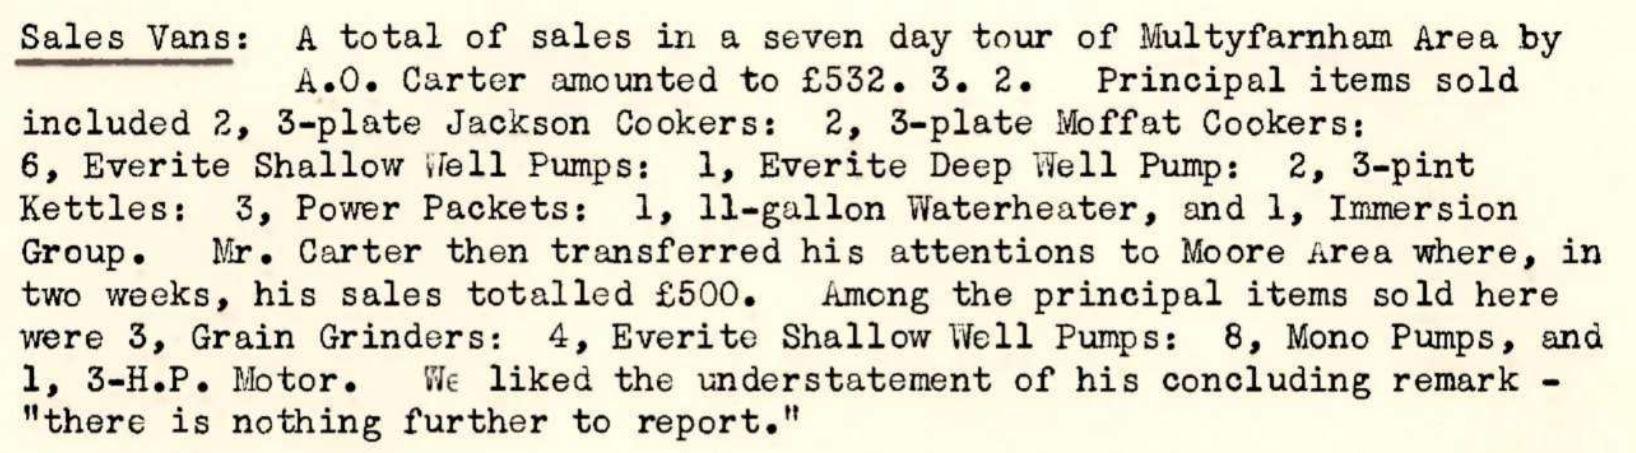 REO News, August 1950, p. 10